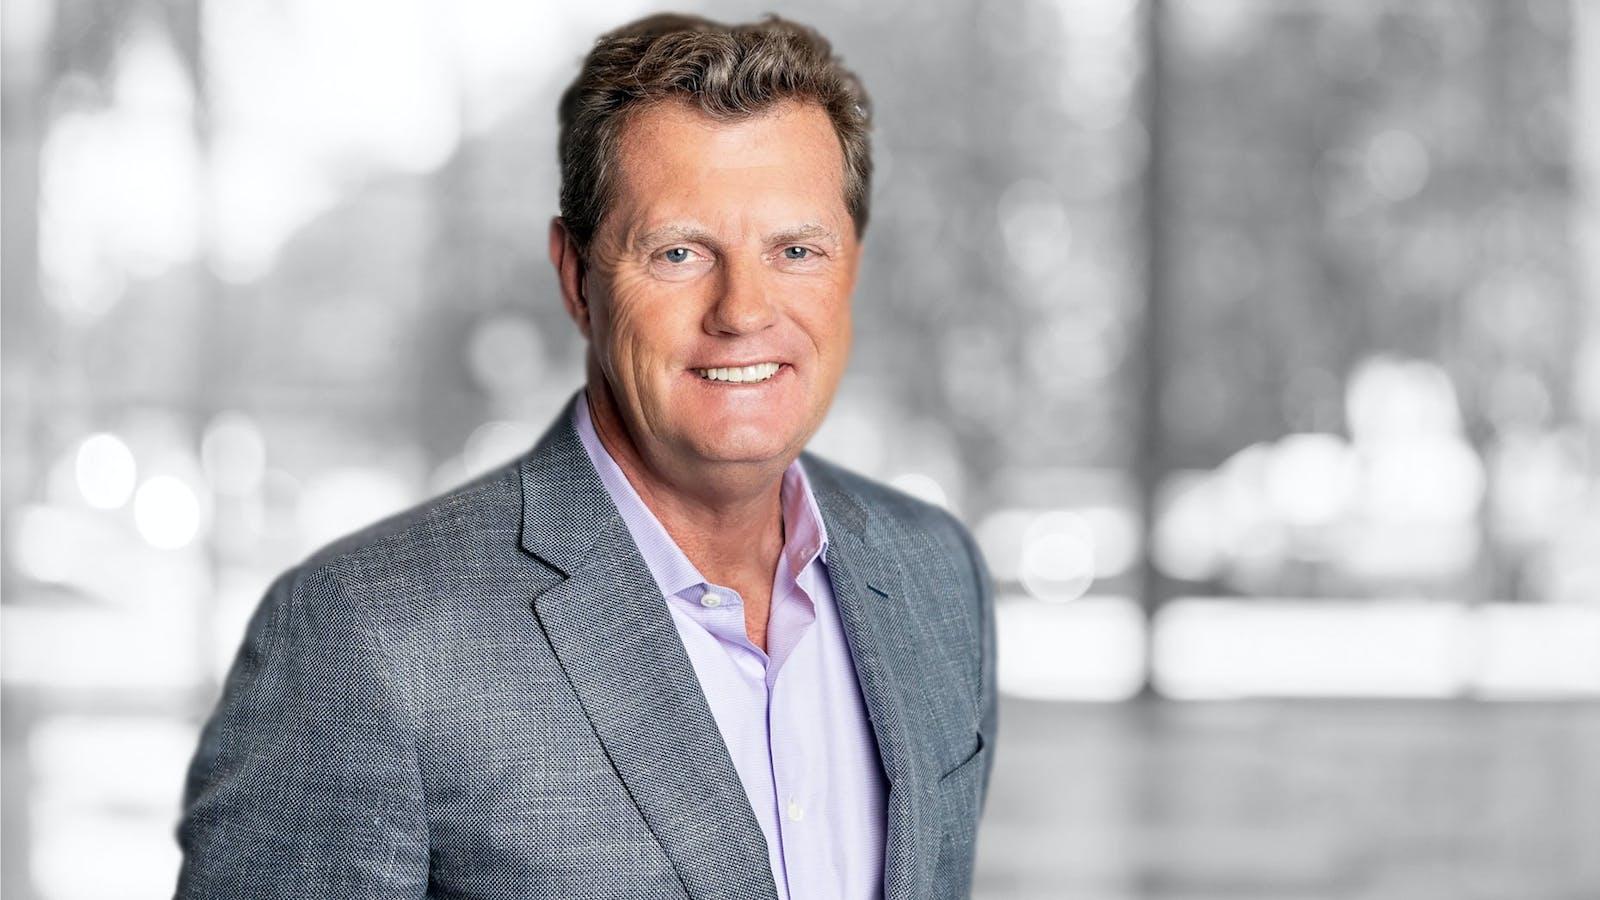 Snowflake CEO Frank Slootman. Photo by Snowflake